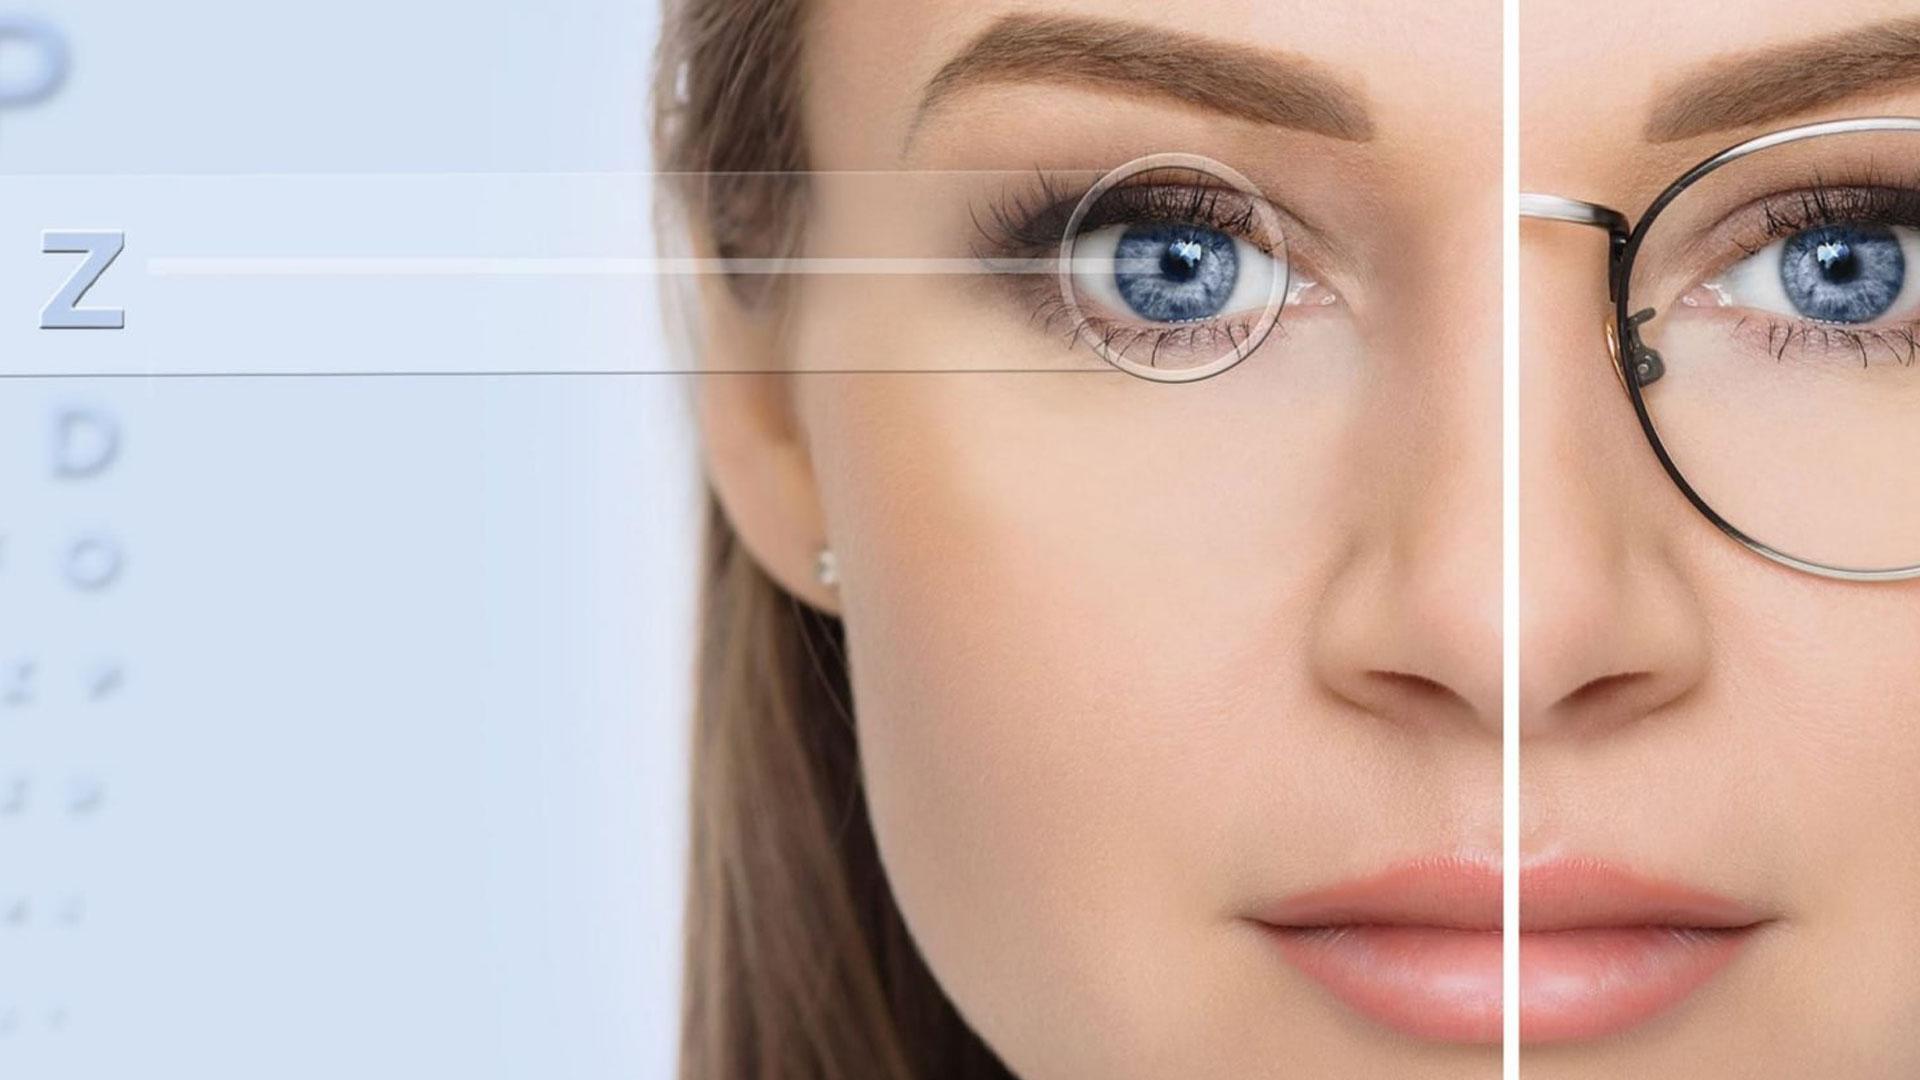 Investigații oftalmologice - OftalmoMED - Clinică Oftalmologie Bistrița